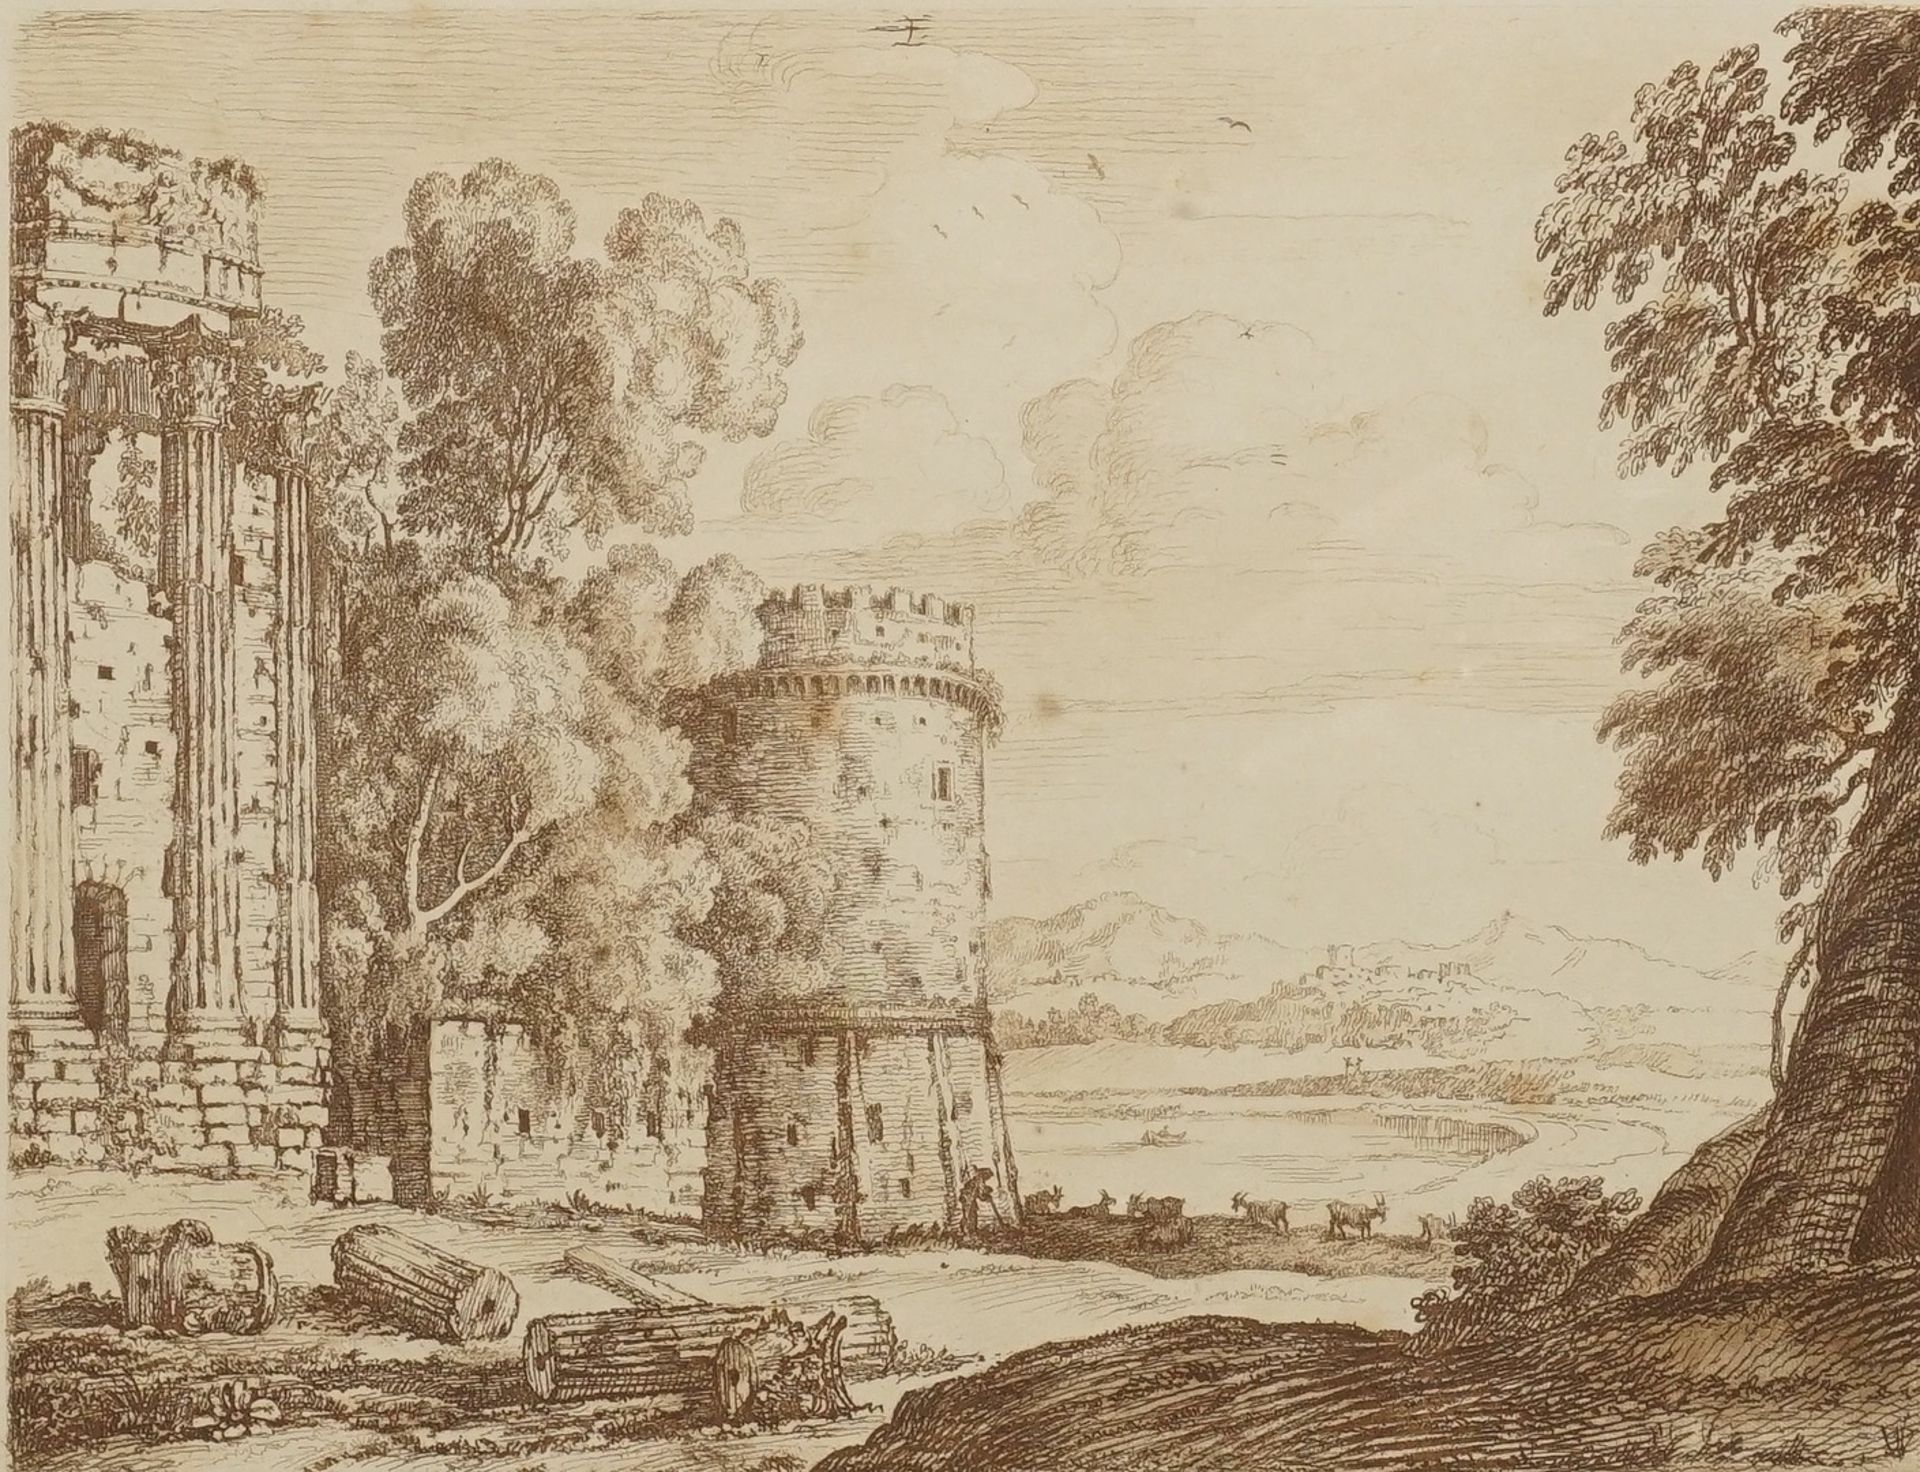 Richard Earlom, Ruinenlandschaft nach Claude Lorrain